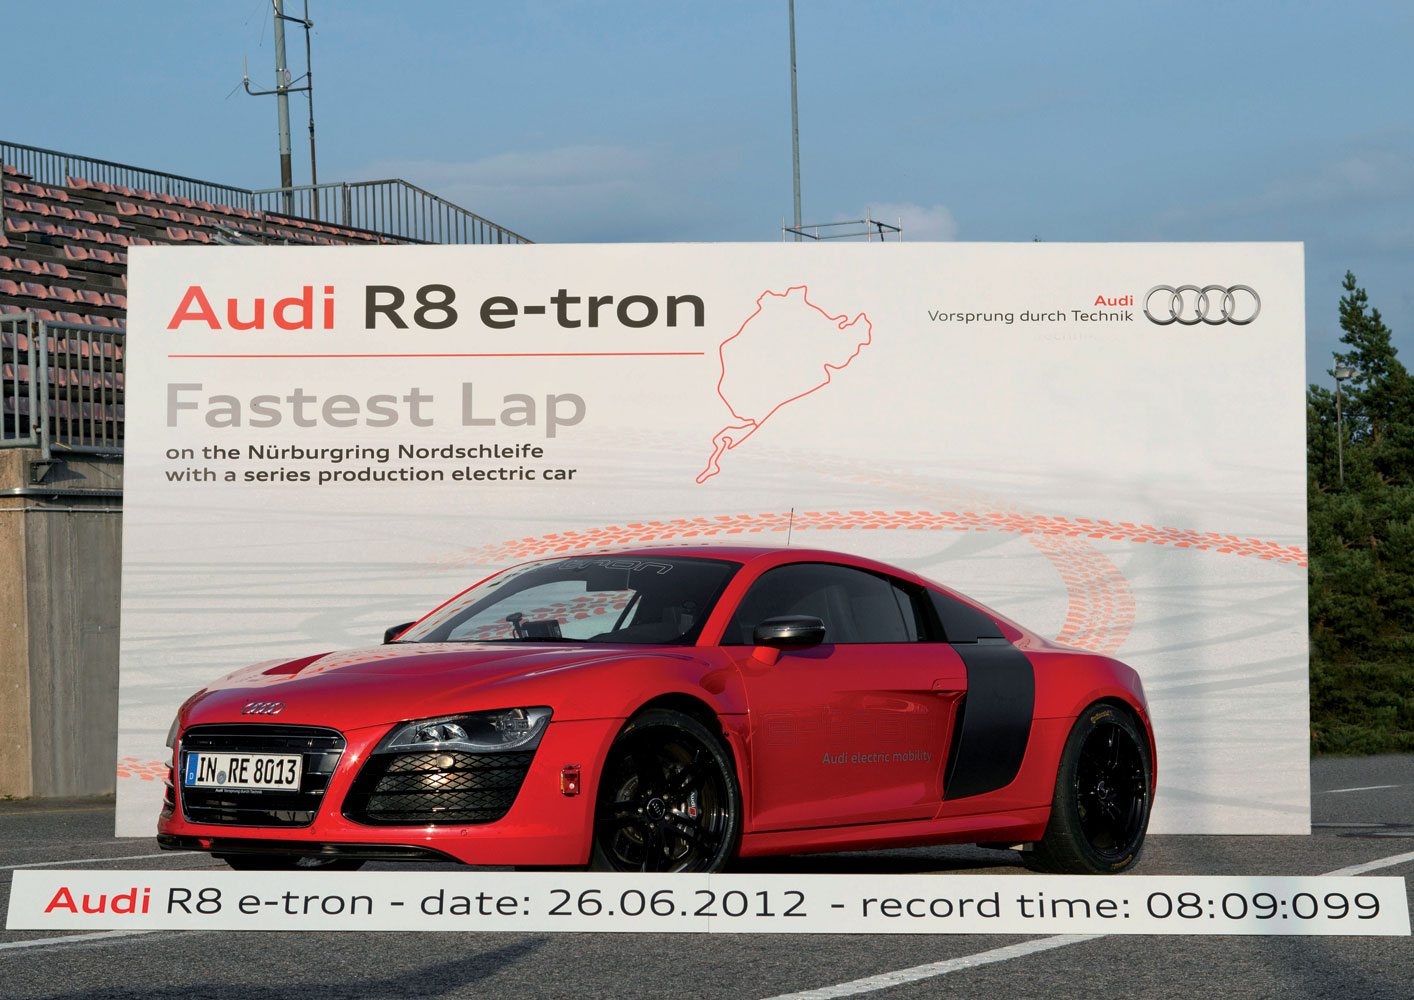 Audi R8 e-tron Rekord auf der Nürburgring Nordschleife [Video]